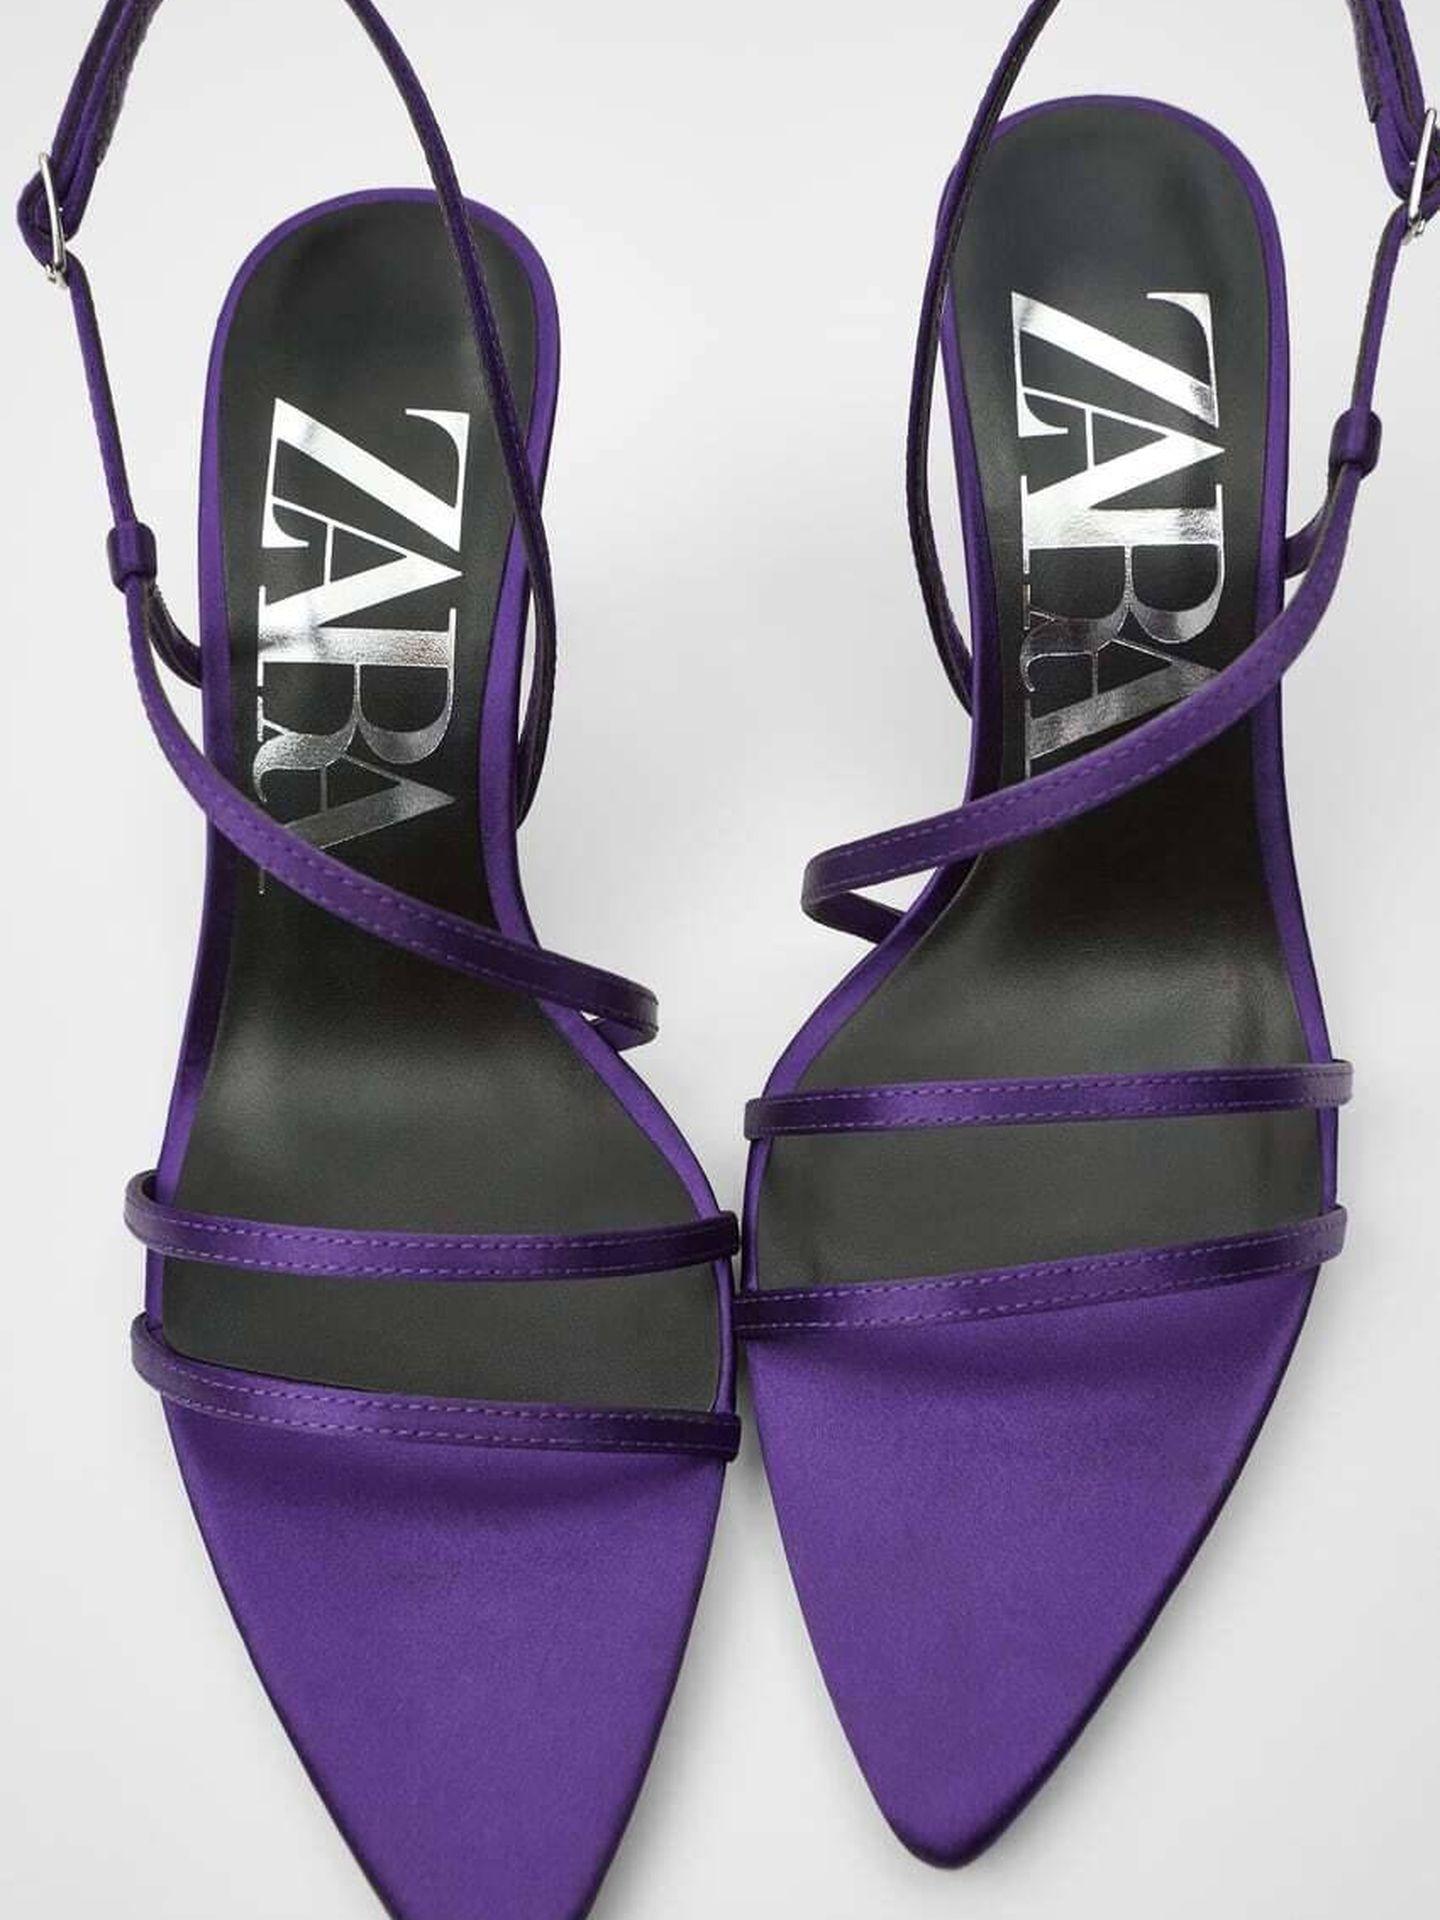 Sandalias de Zara. (Cortesía)